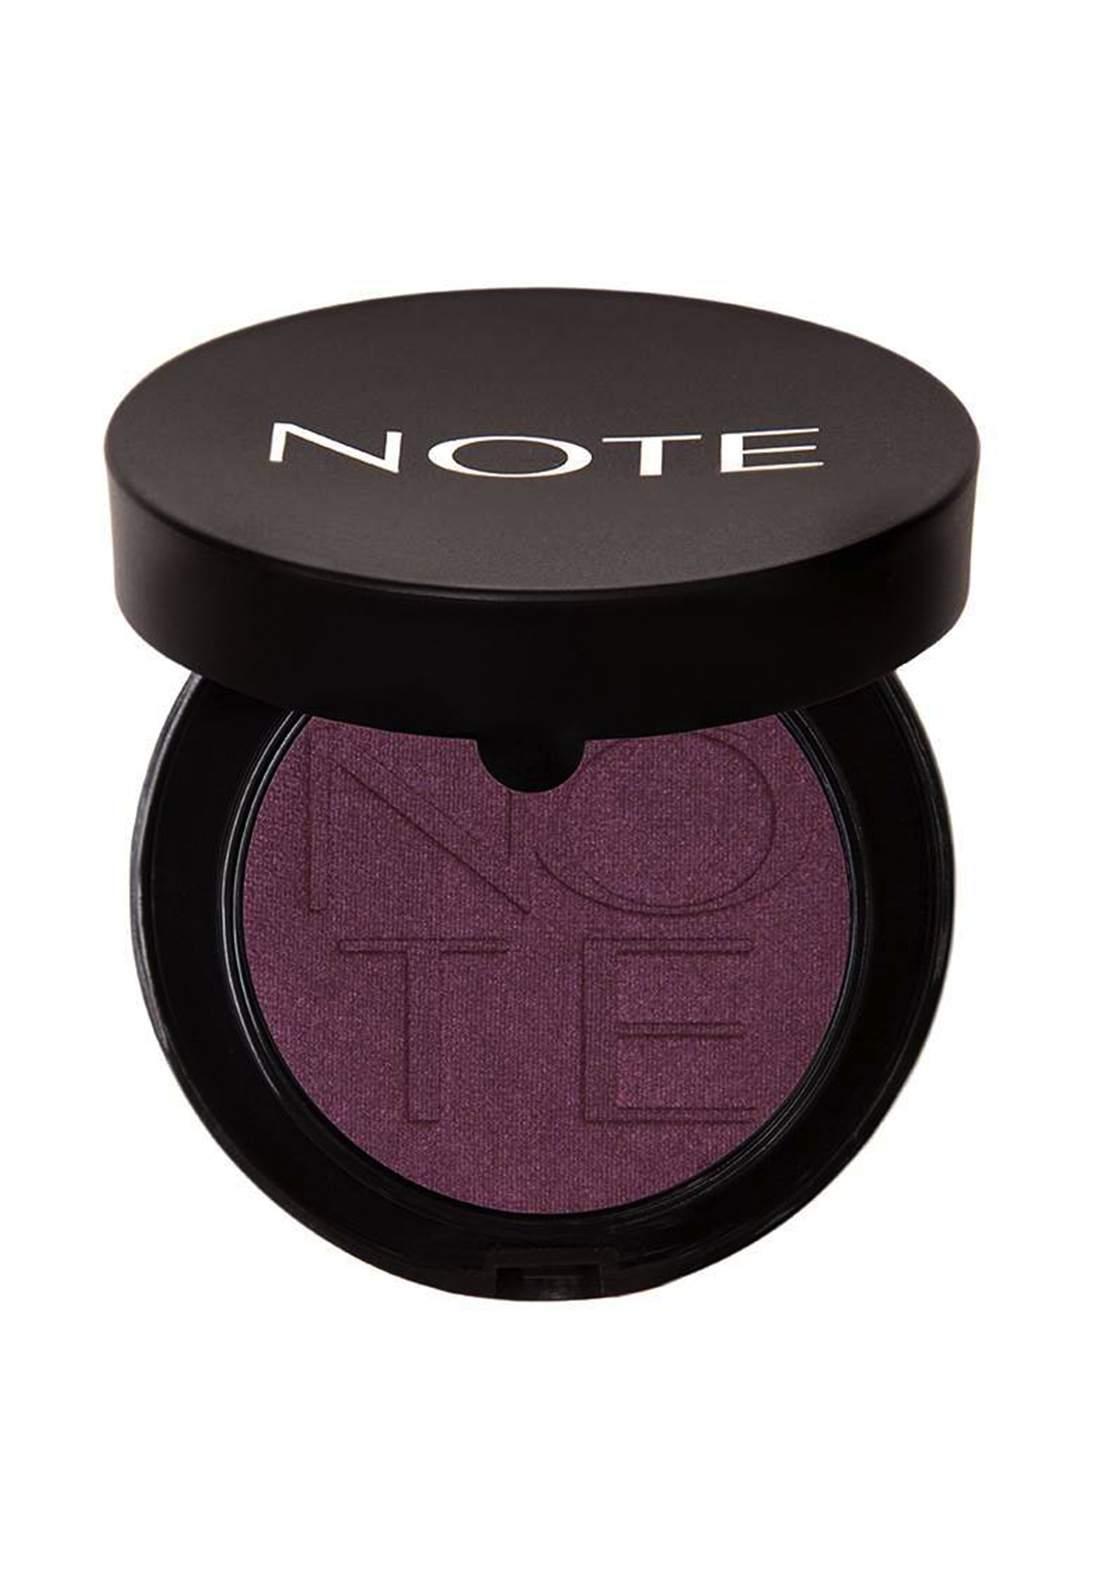 Note Luminous Silk Mono Eyeshadow No.10 ظلال للعيون